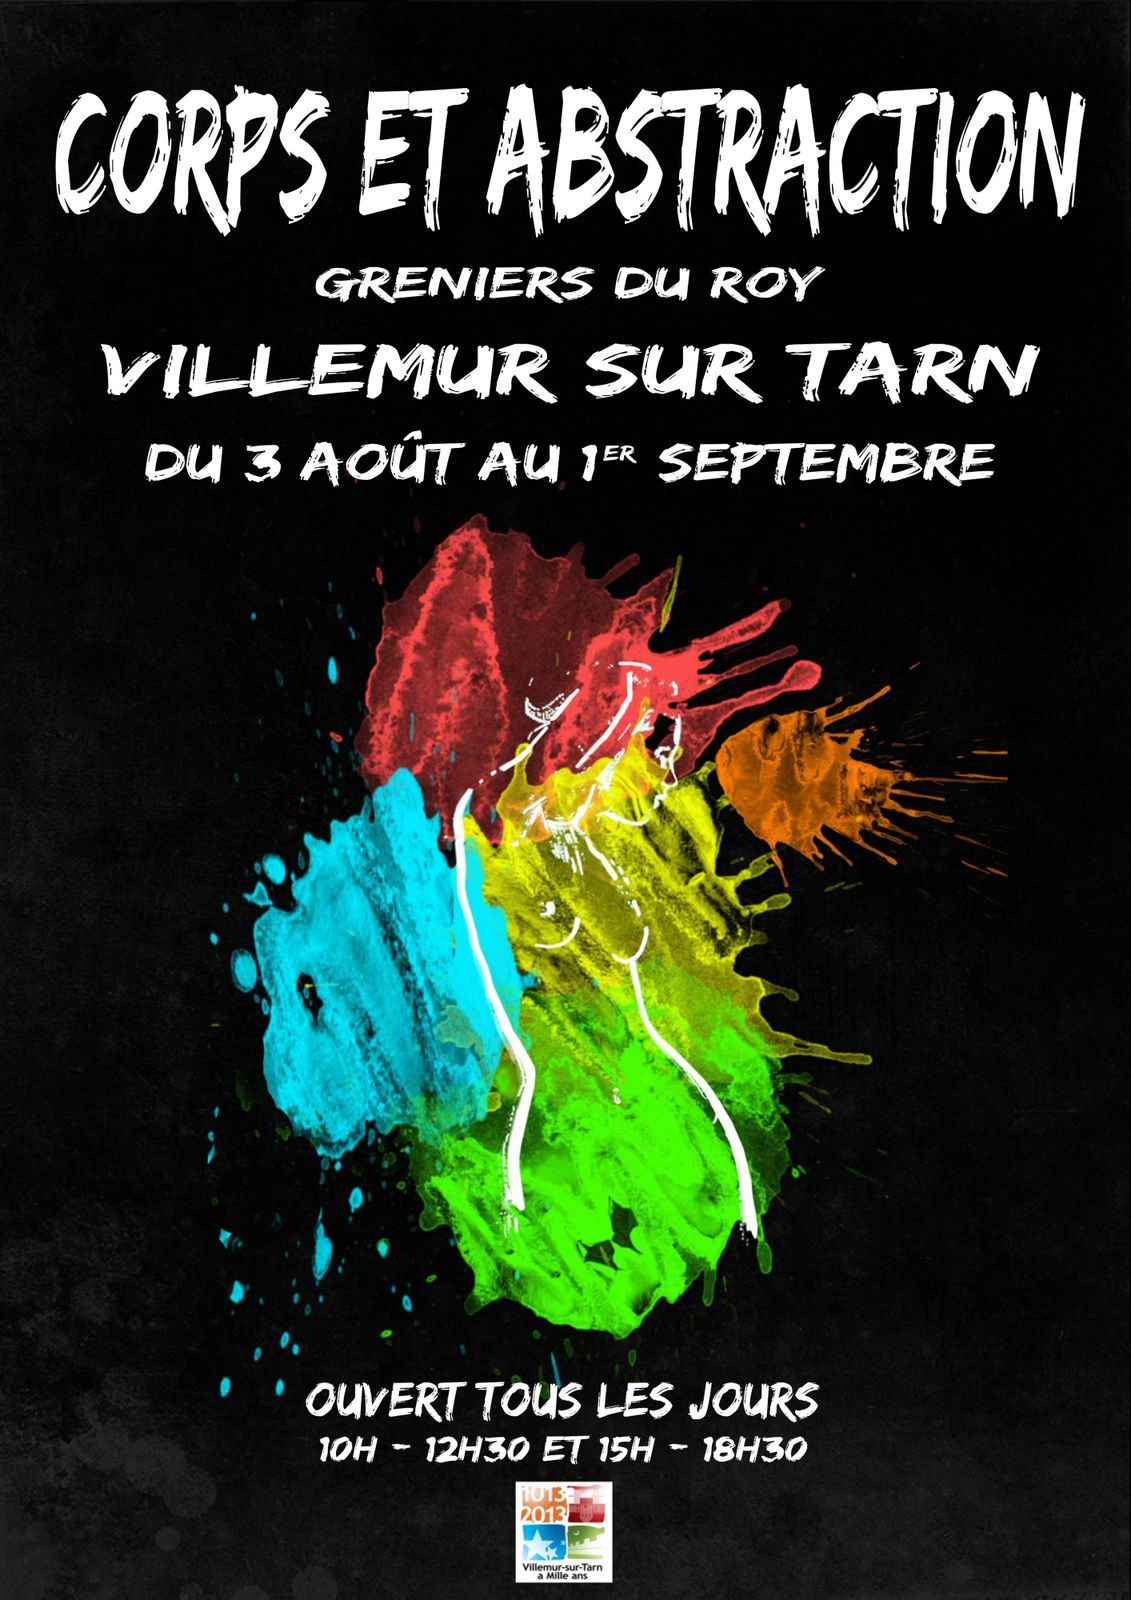 Villemur sur Tarn, exposition « Corps et abstraction ».